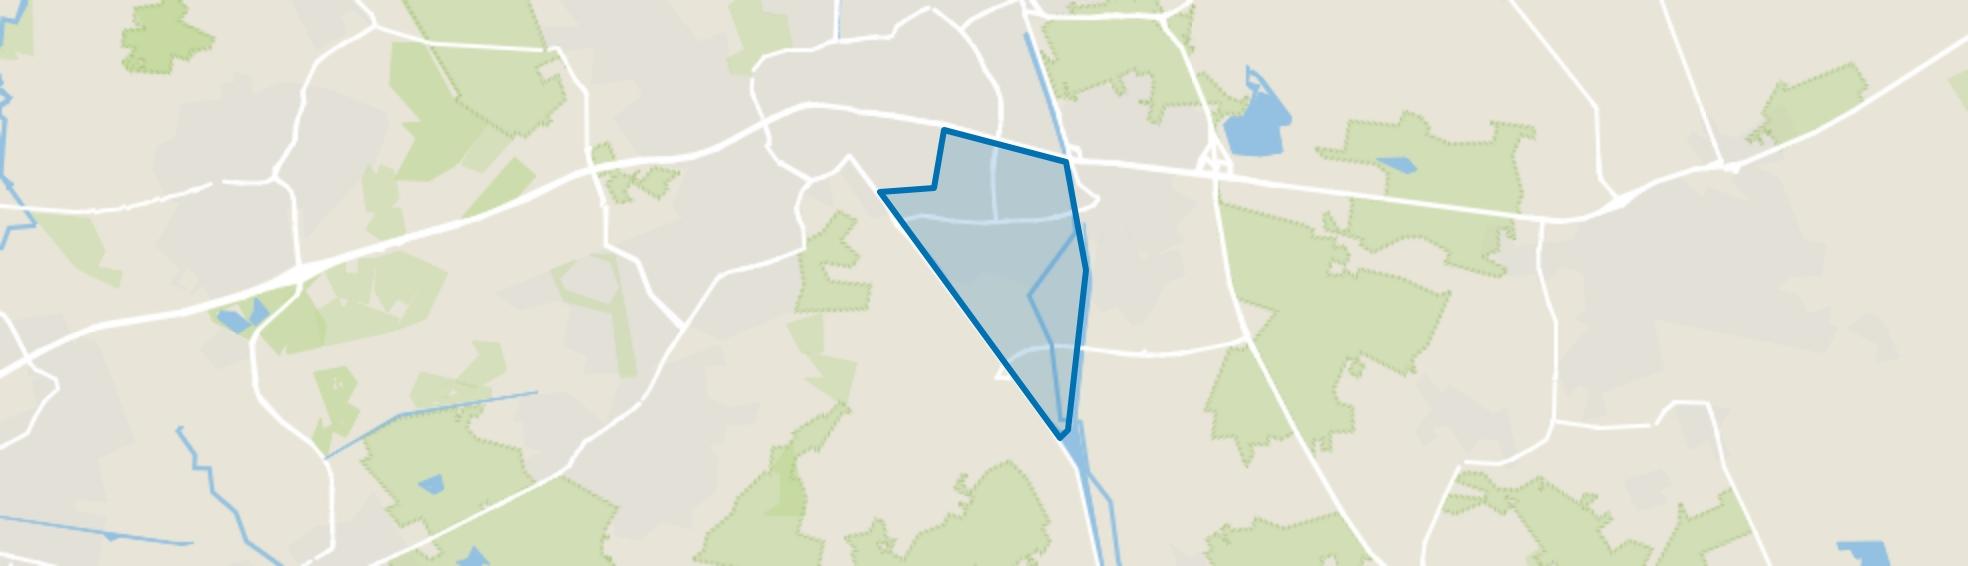 Hoogeind, Helmond map